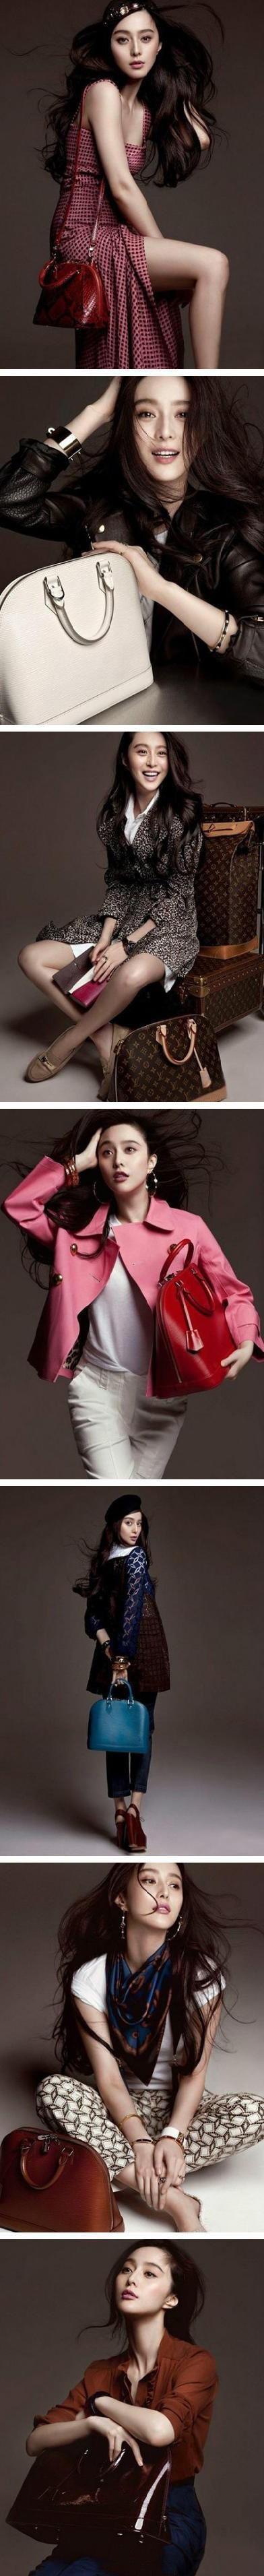 Louis Vuitton clipart famous fashion Ideas LV The Bingbing my